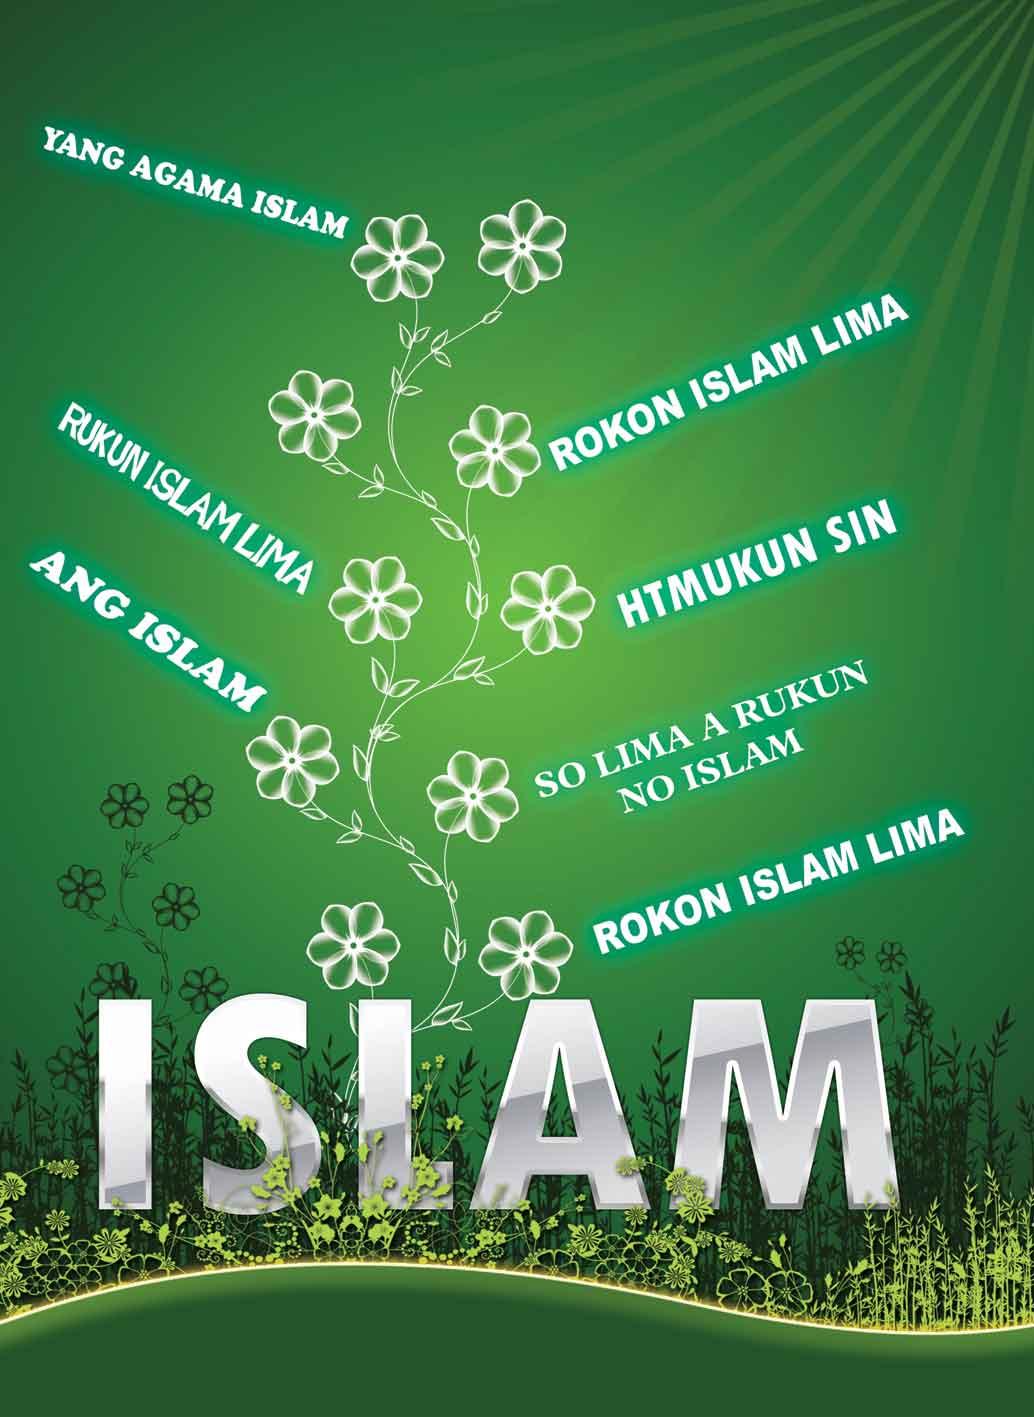 RUKUN ISLAM LIMA